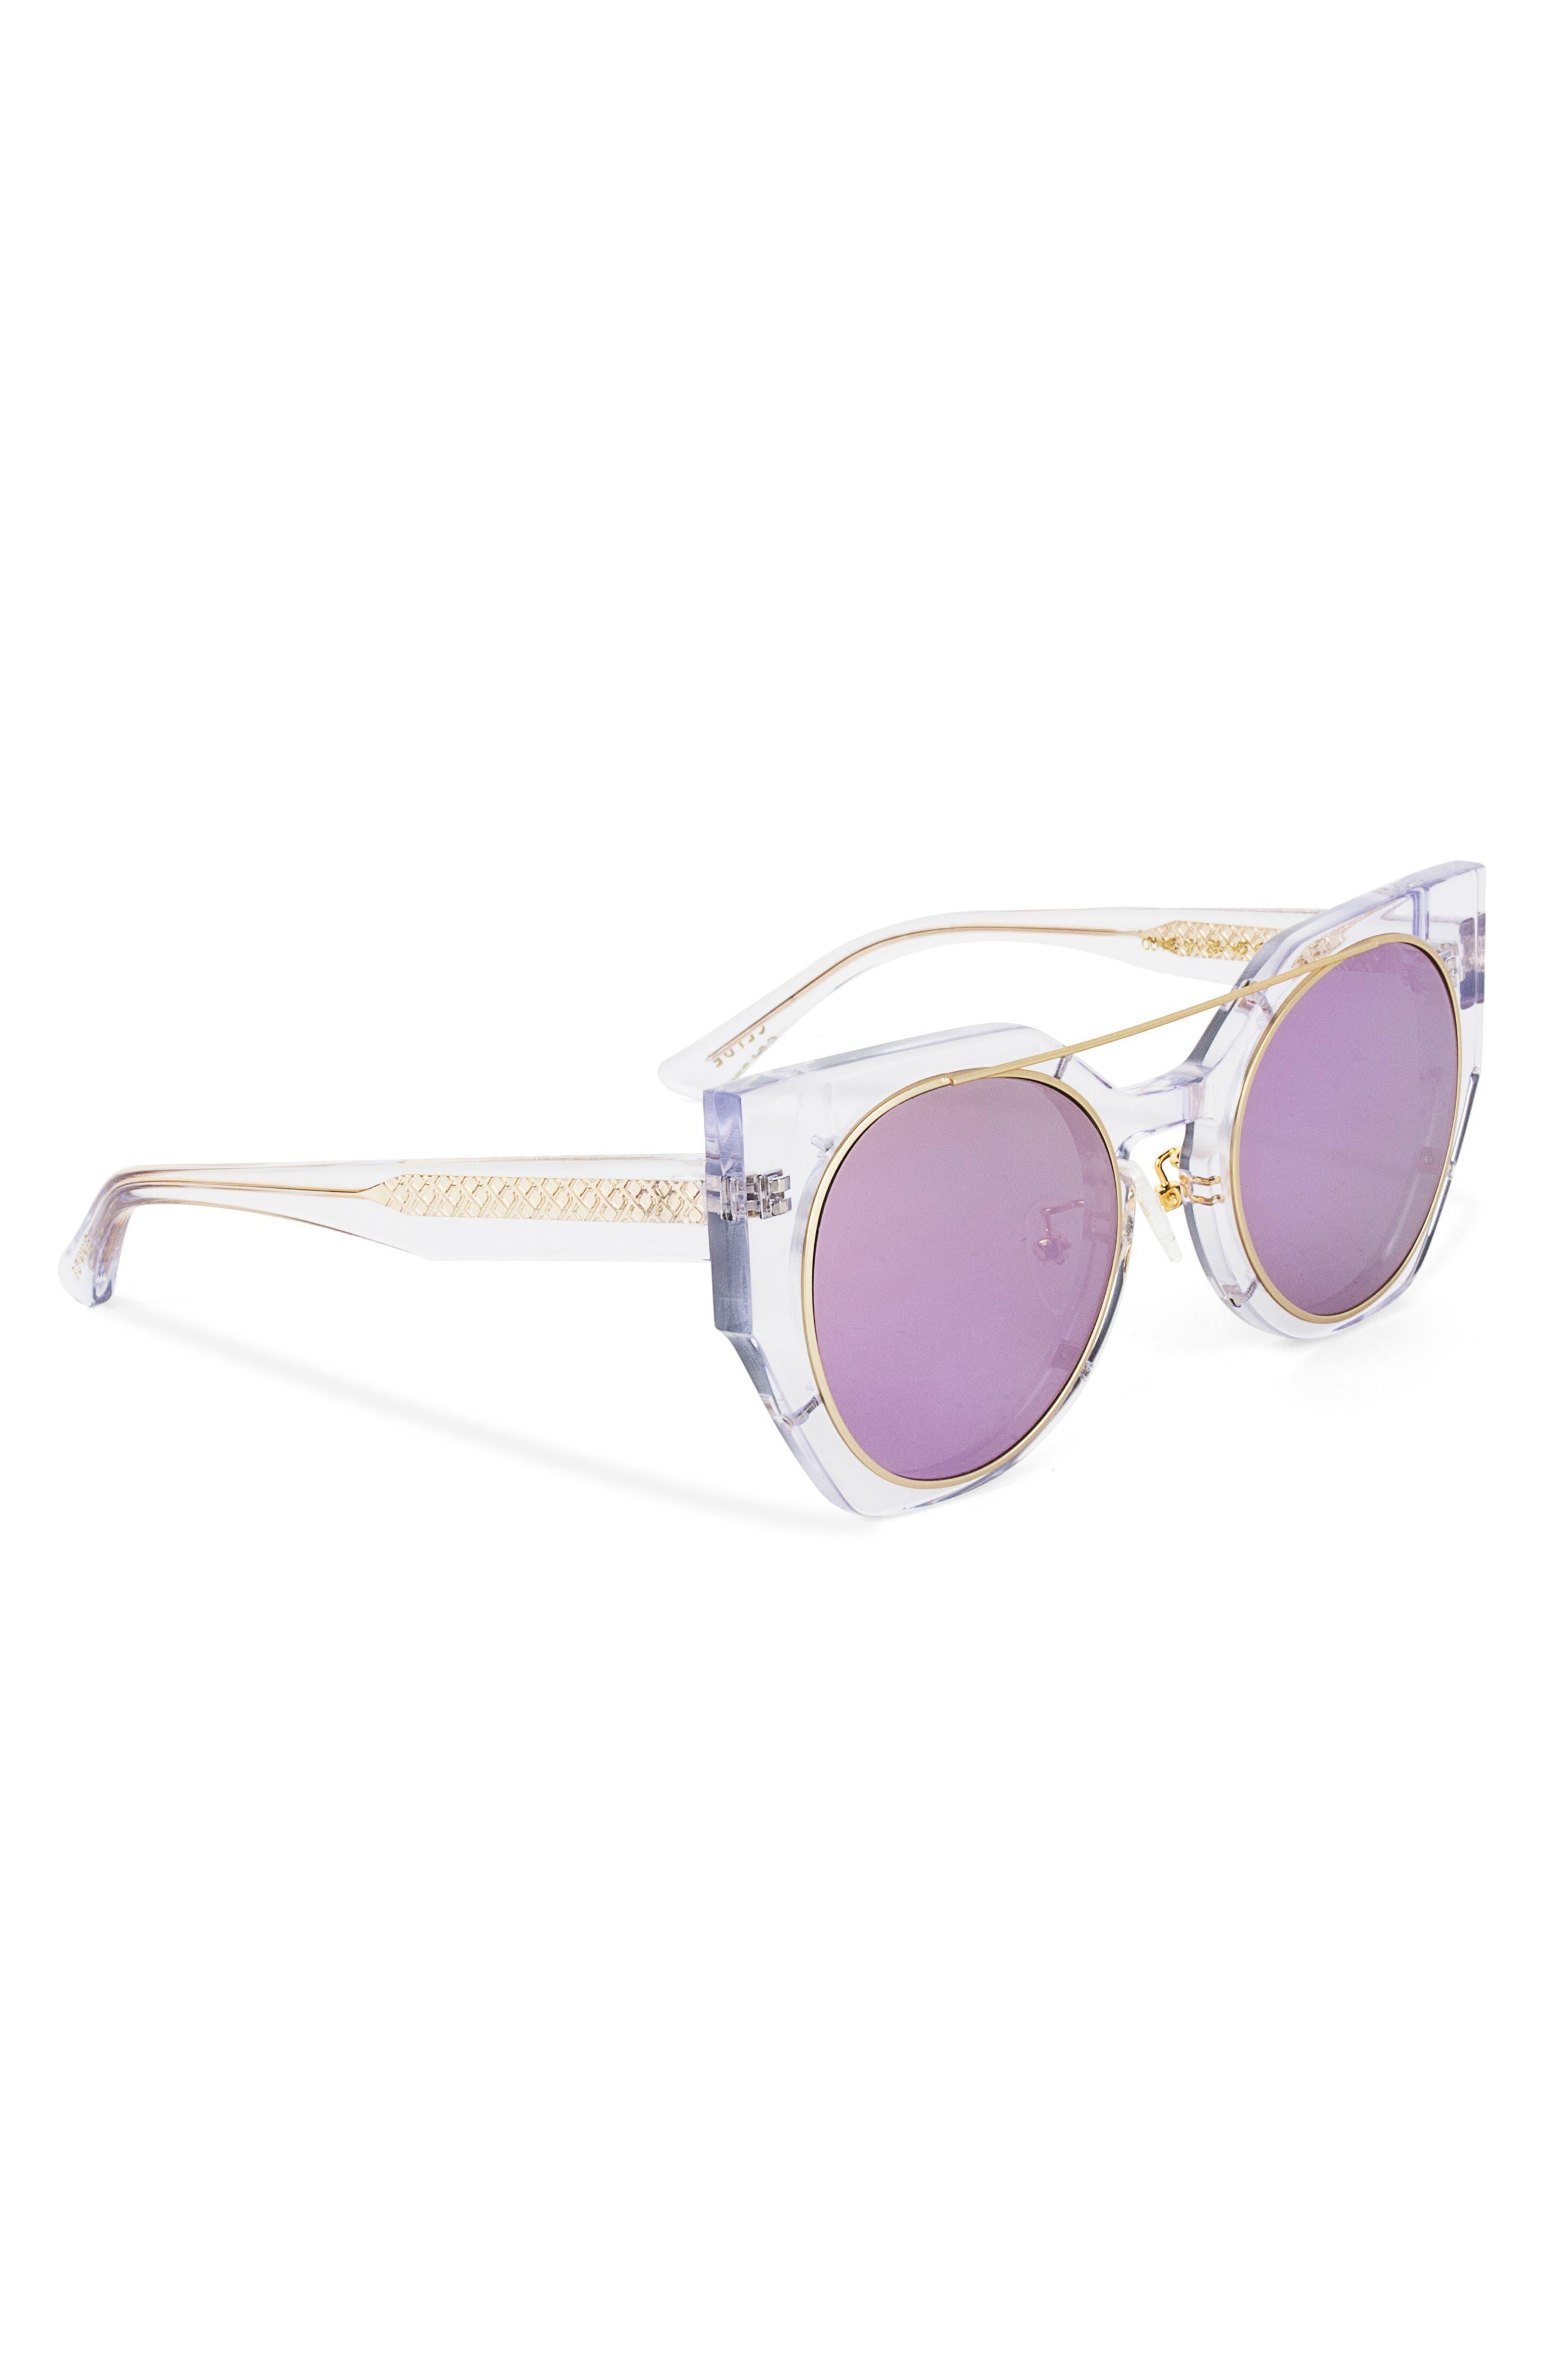 Olive 51mm Polarized Cat Eye Sunglasses,                             Alternate thumbnail 8, color,